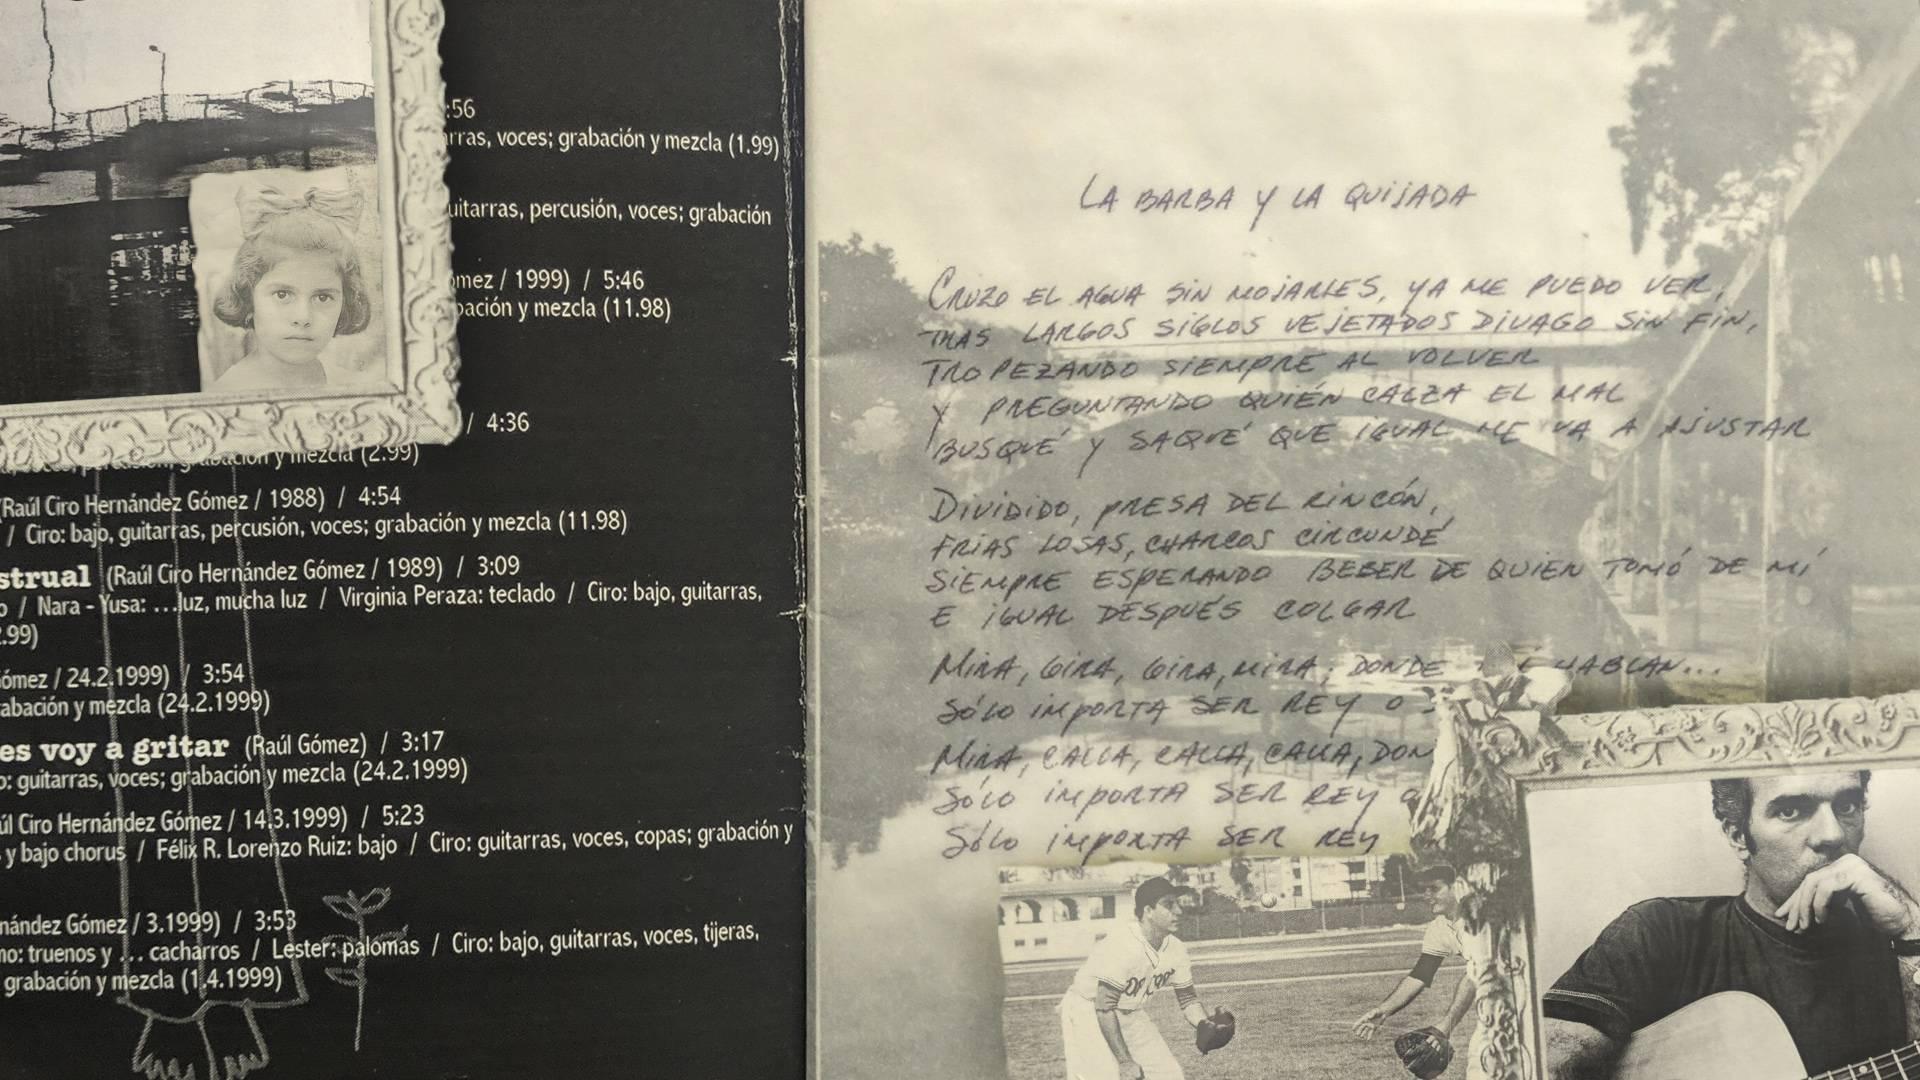 Fragments of the cover of the album Ciro 3C, by Raúl Ciro. Image: Maria José Sardiñas.